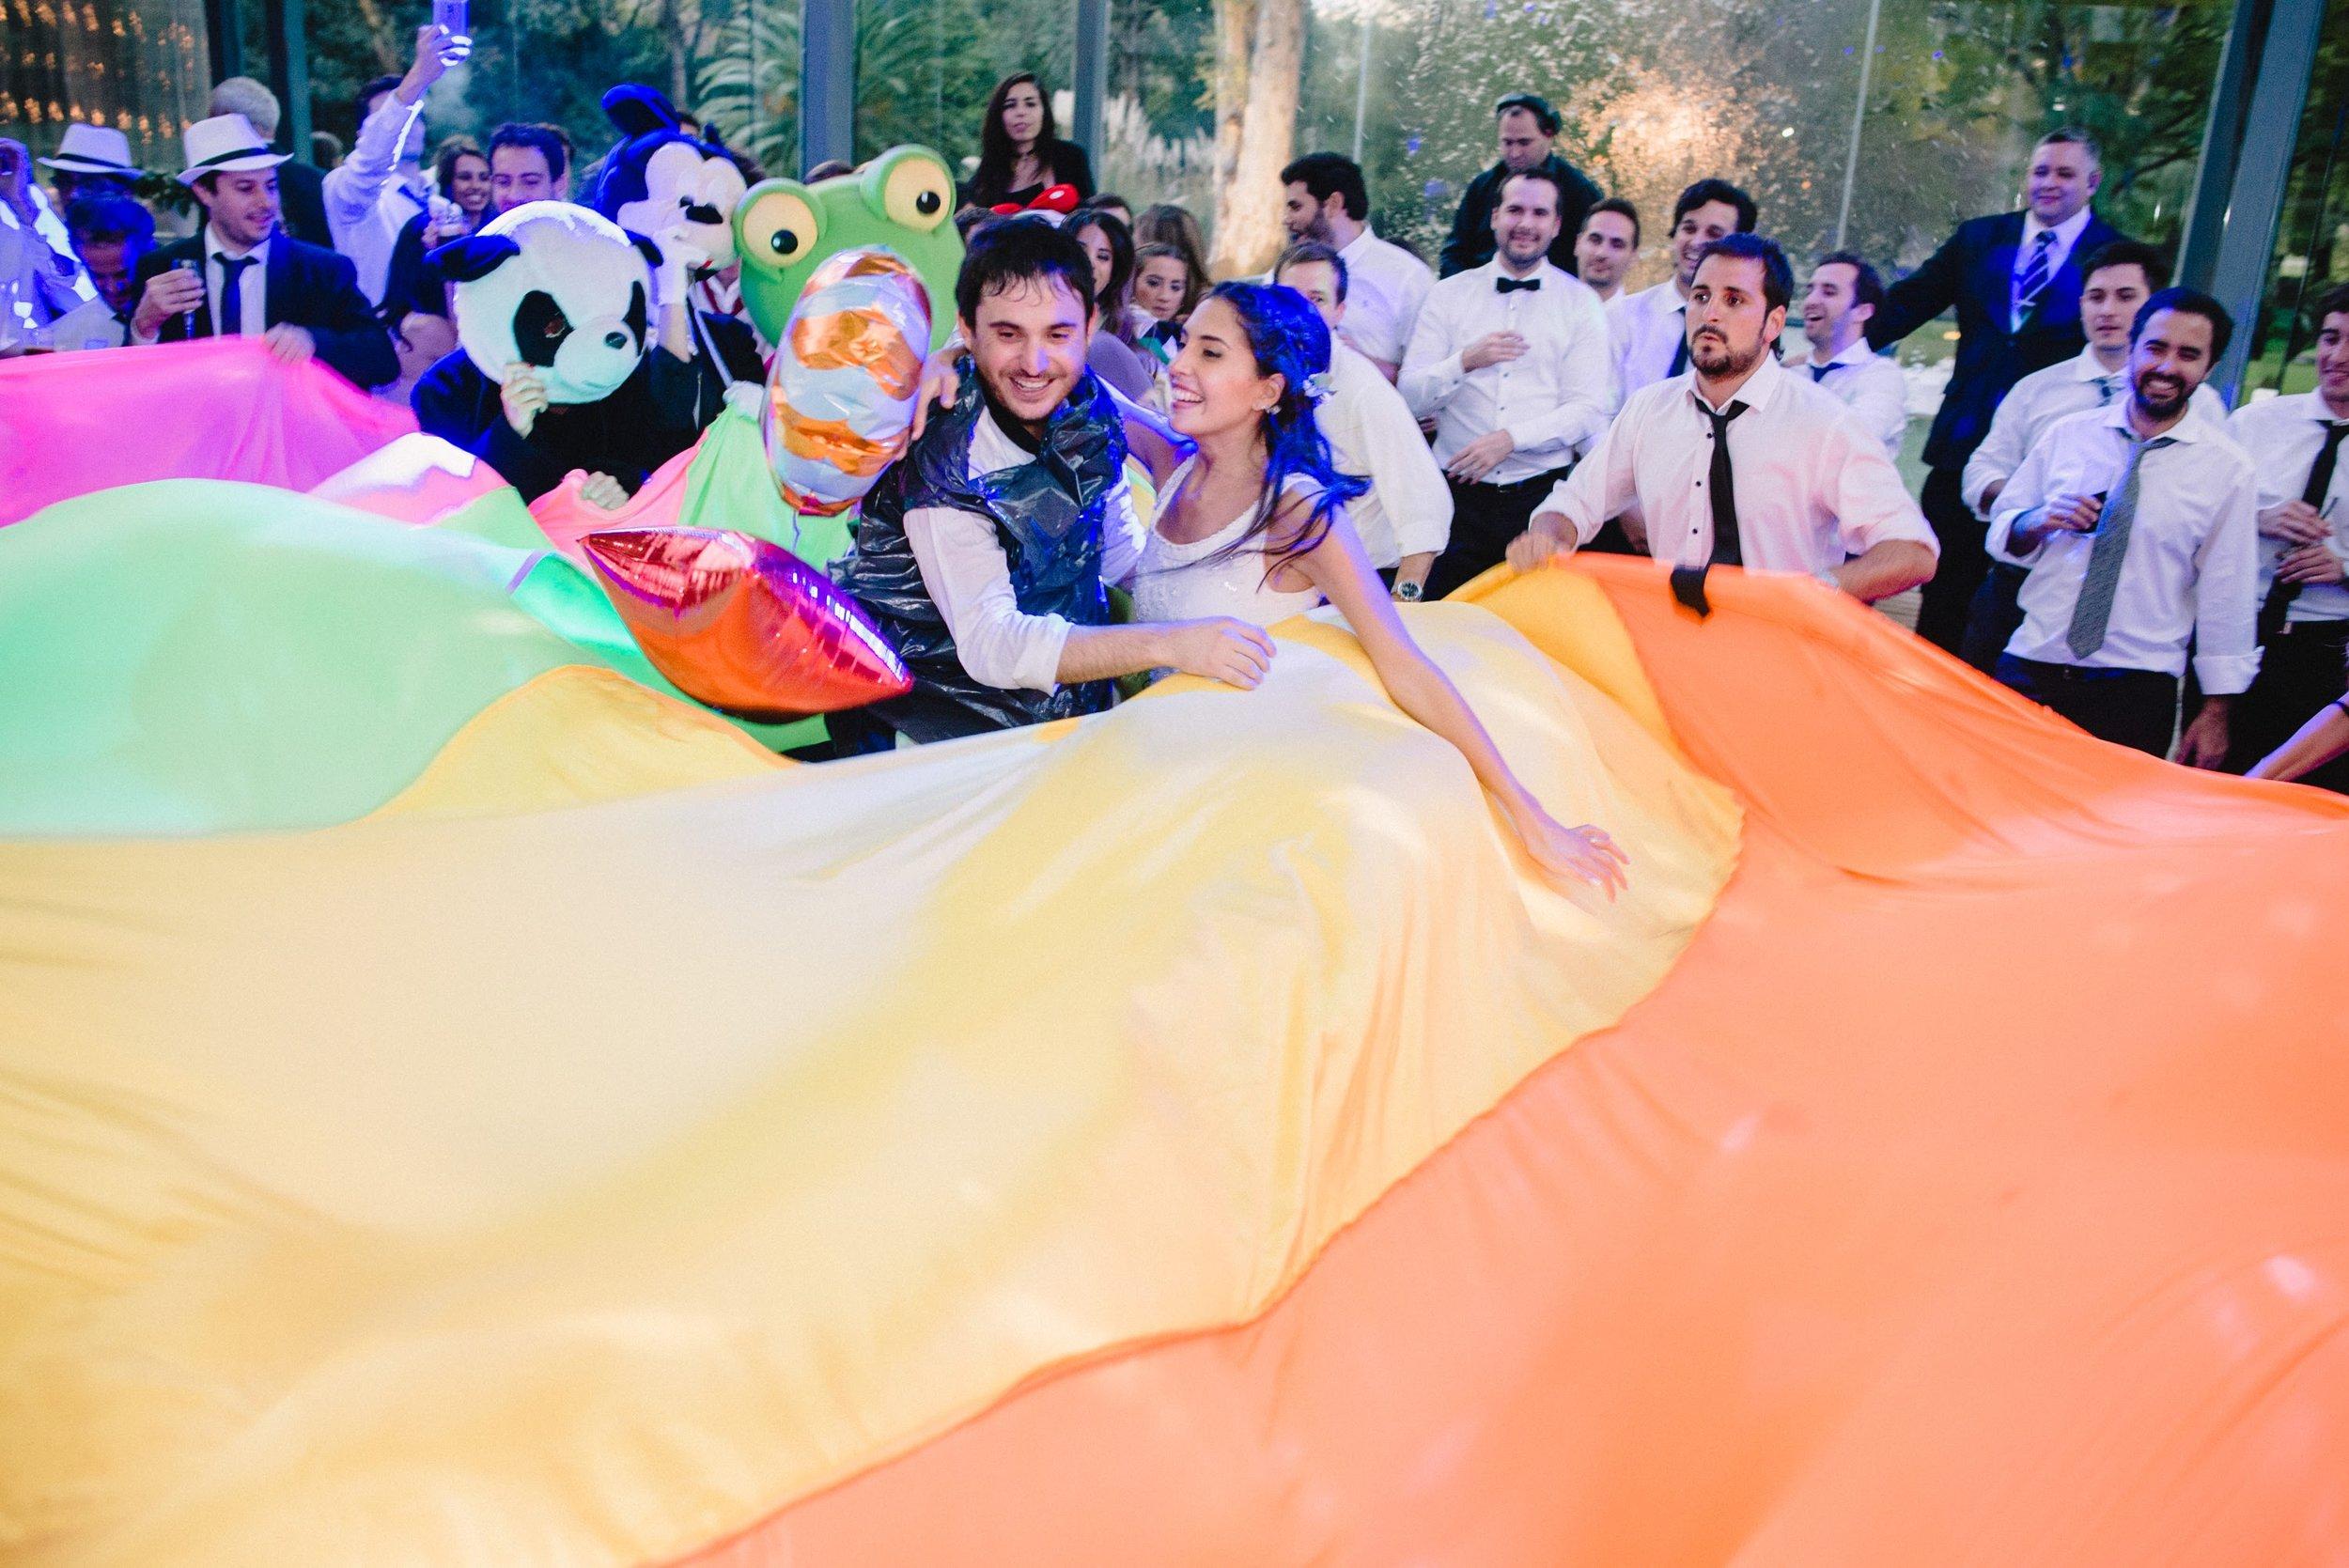 fotografo de bodas en carlos paz cordoba 081.JPG